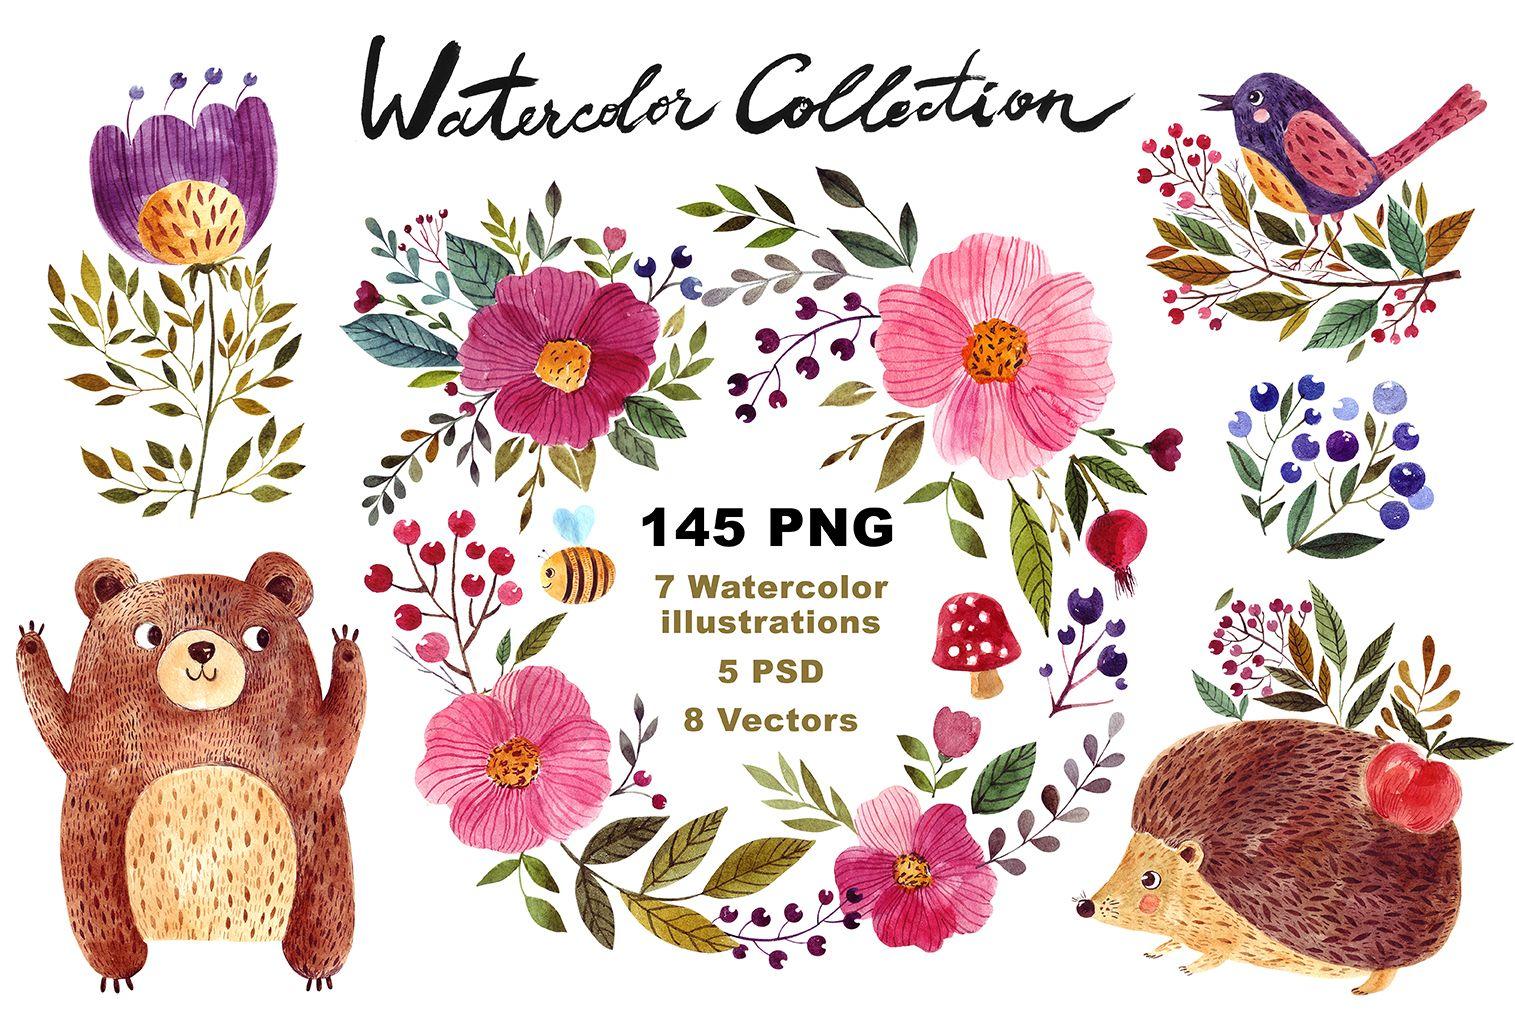 Big Watercolor Forest Collection #ad #design #photoshop #coreldraw #adobeillustrator #graphicdesign #logodesign #kids #nursery #babyshower #babyregistry #cricutmade #cricutexplore #cameo